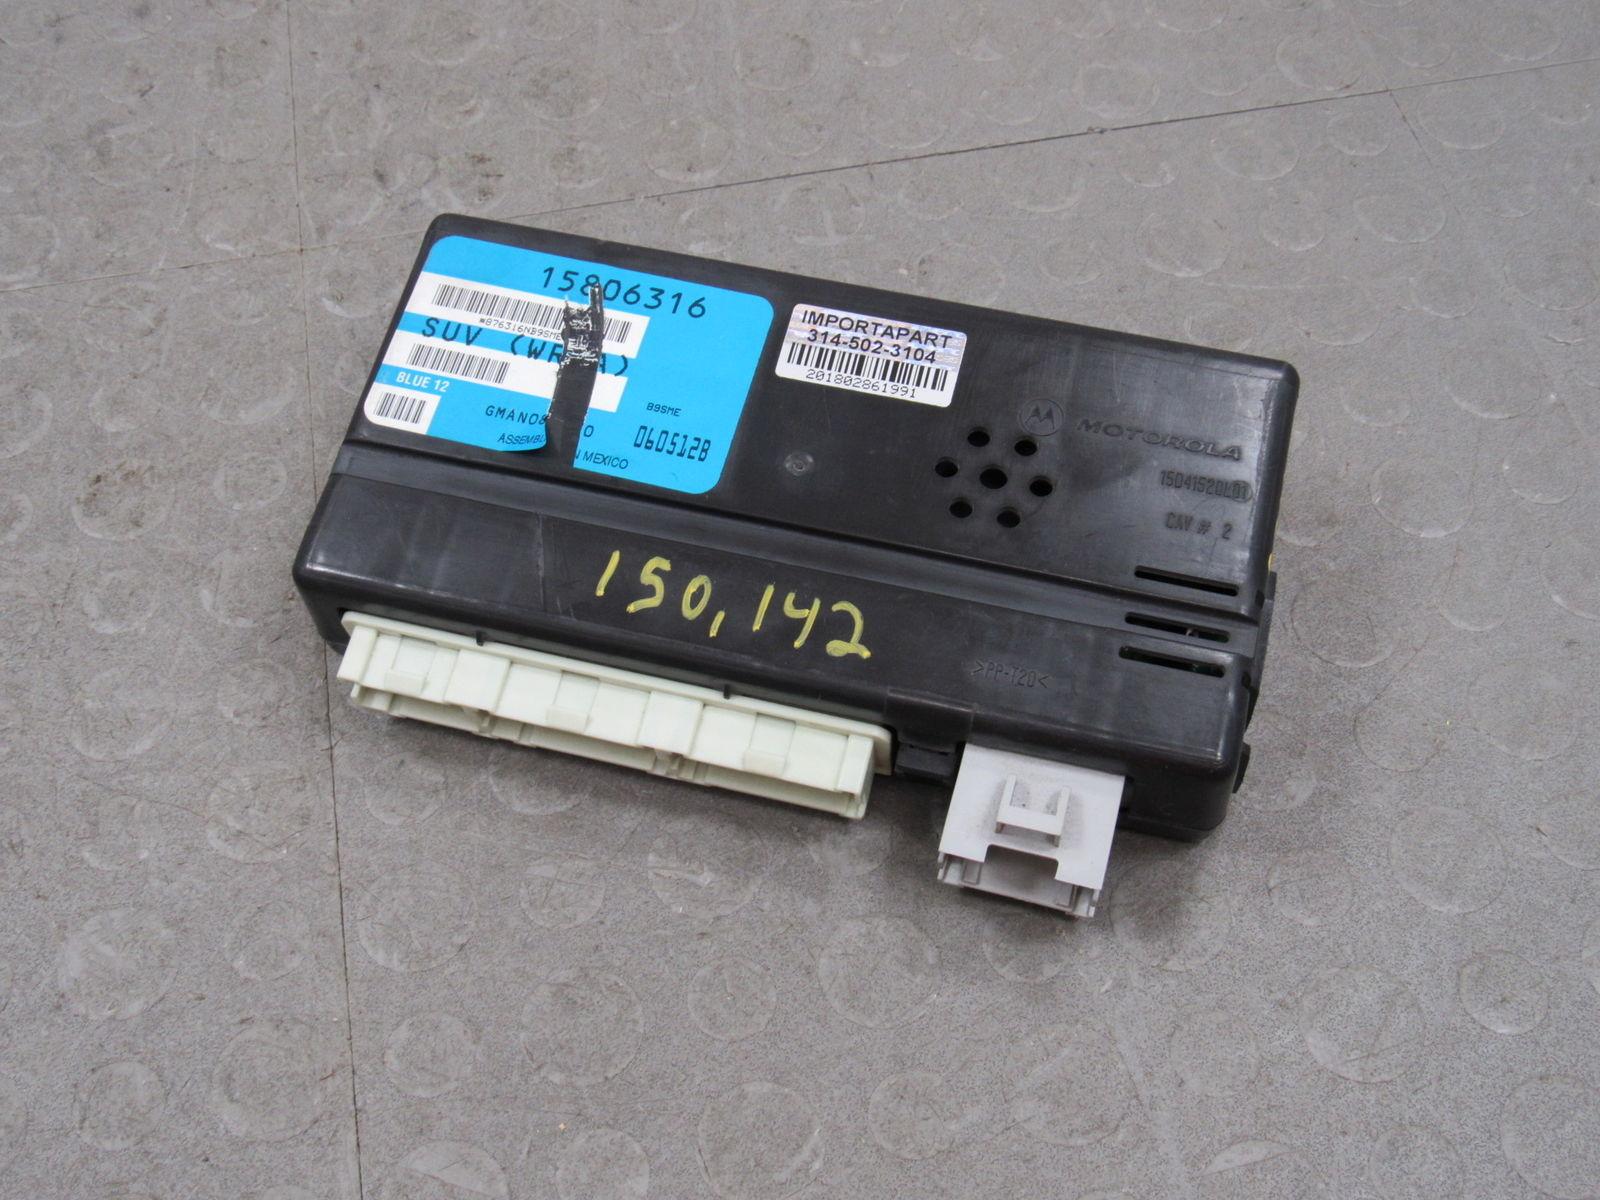 02 03 Saturn Vue Bcm Body Control Multifunction Module 150 142 Miles 15806316 U Importapart